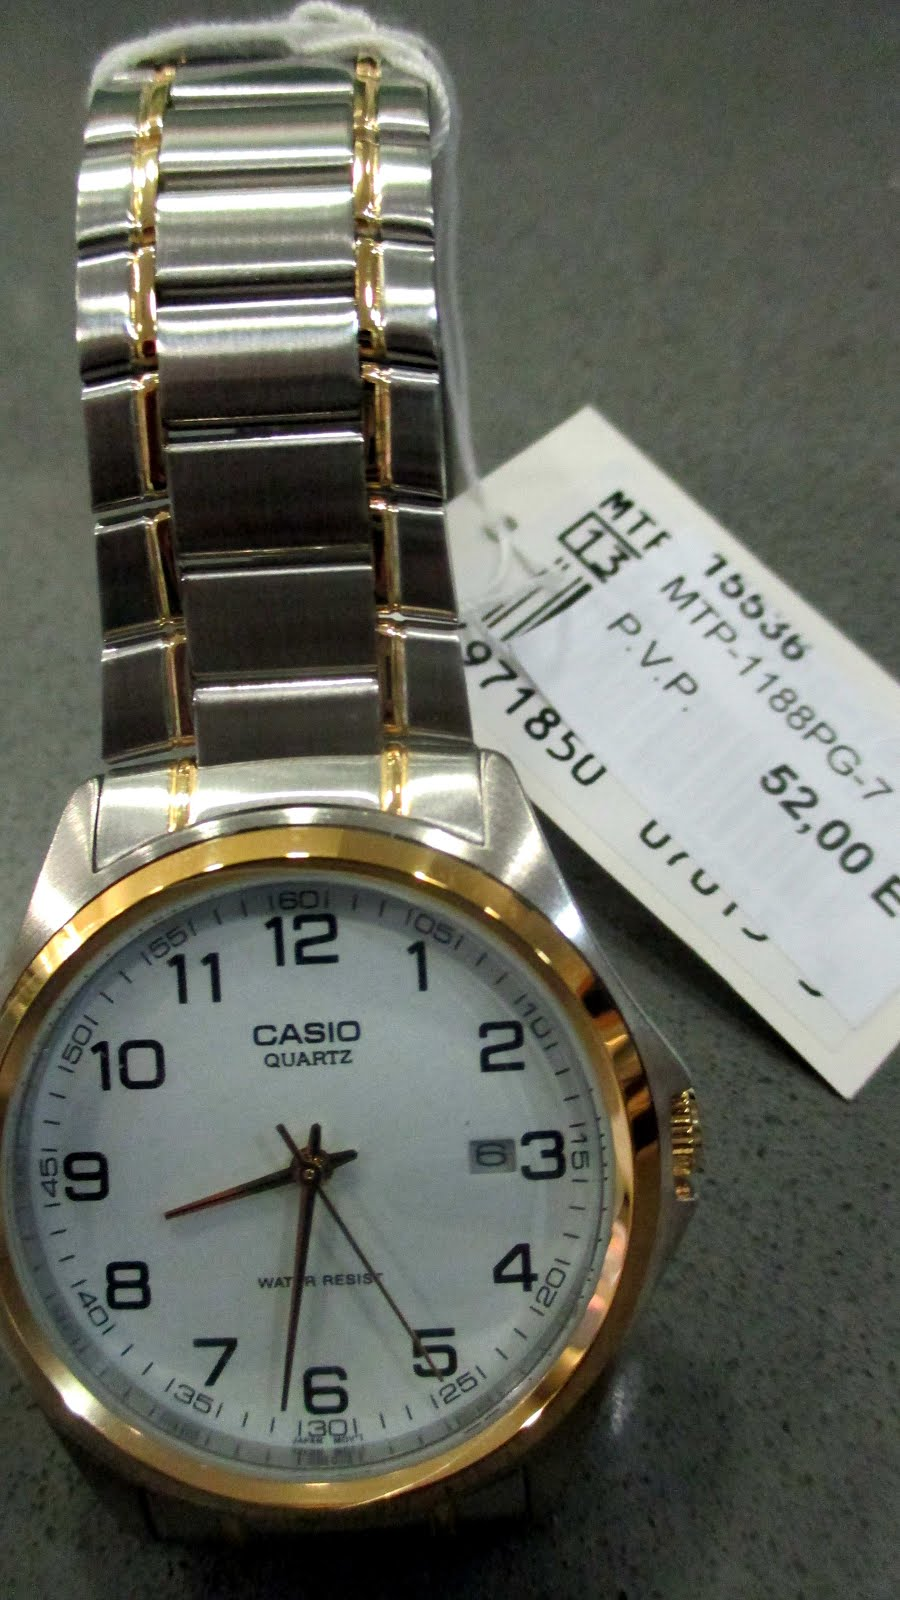 Reloj Casio, bicolor, acero, calendario...